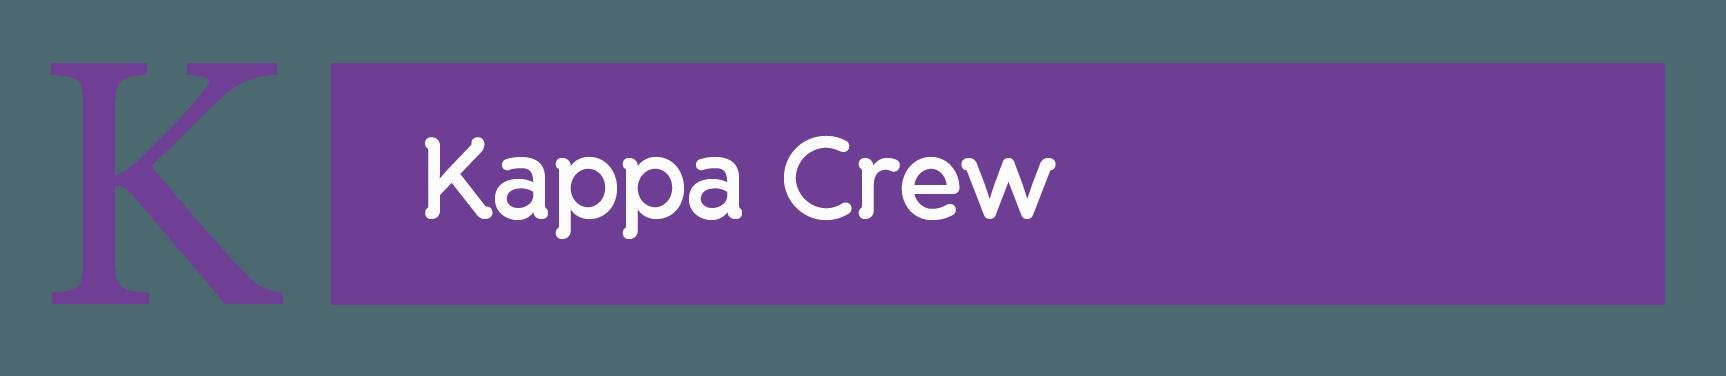 Kappa Crew